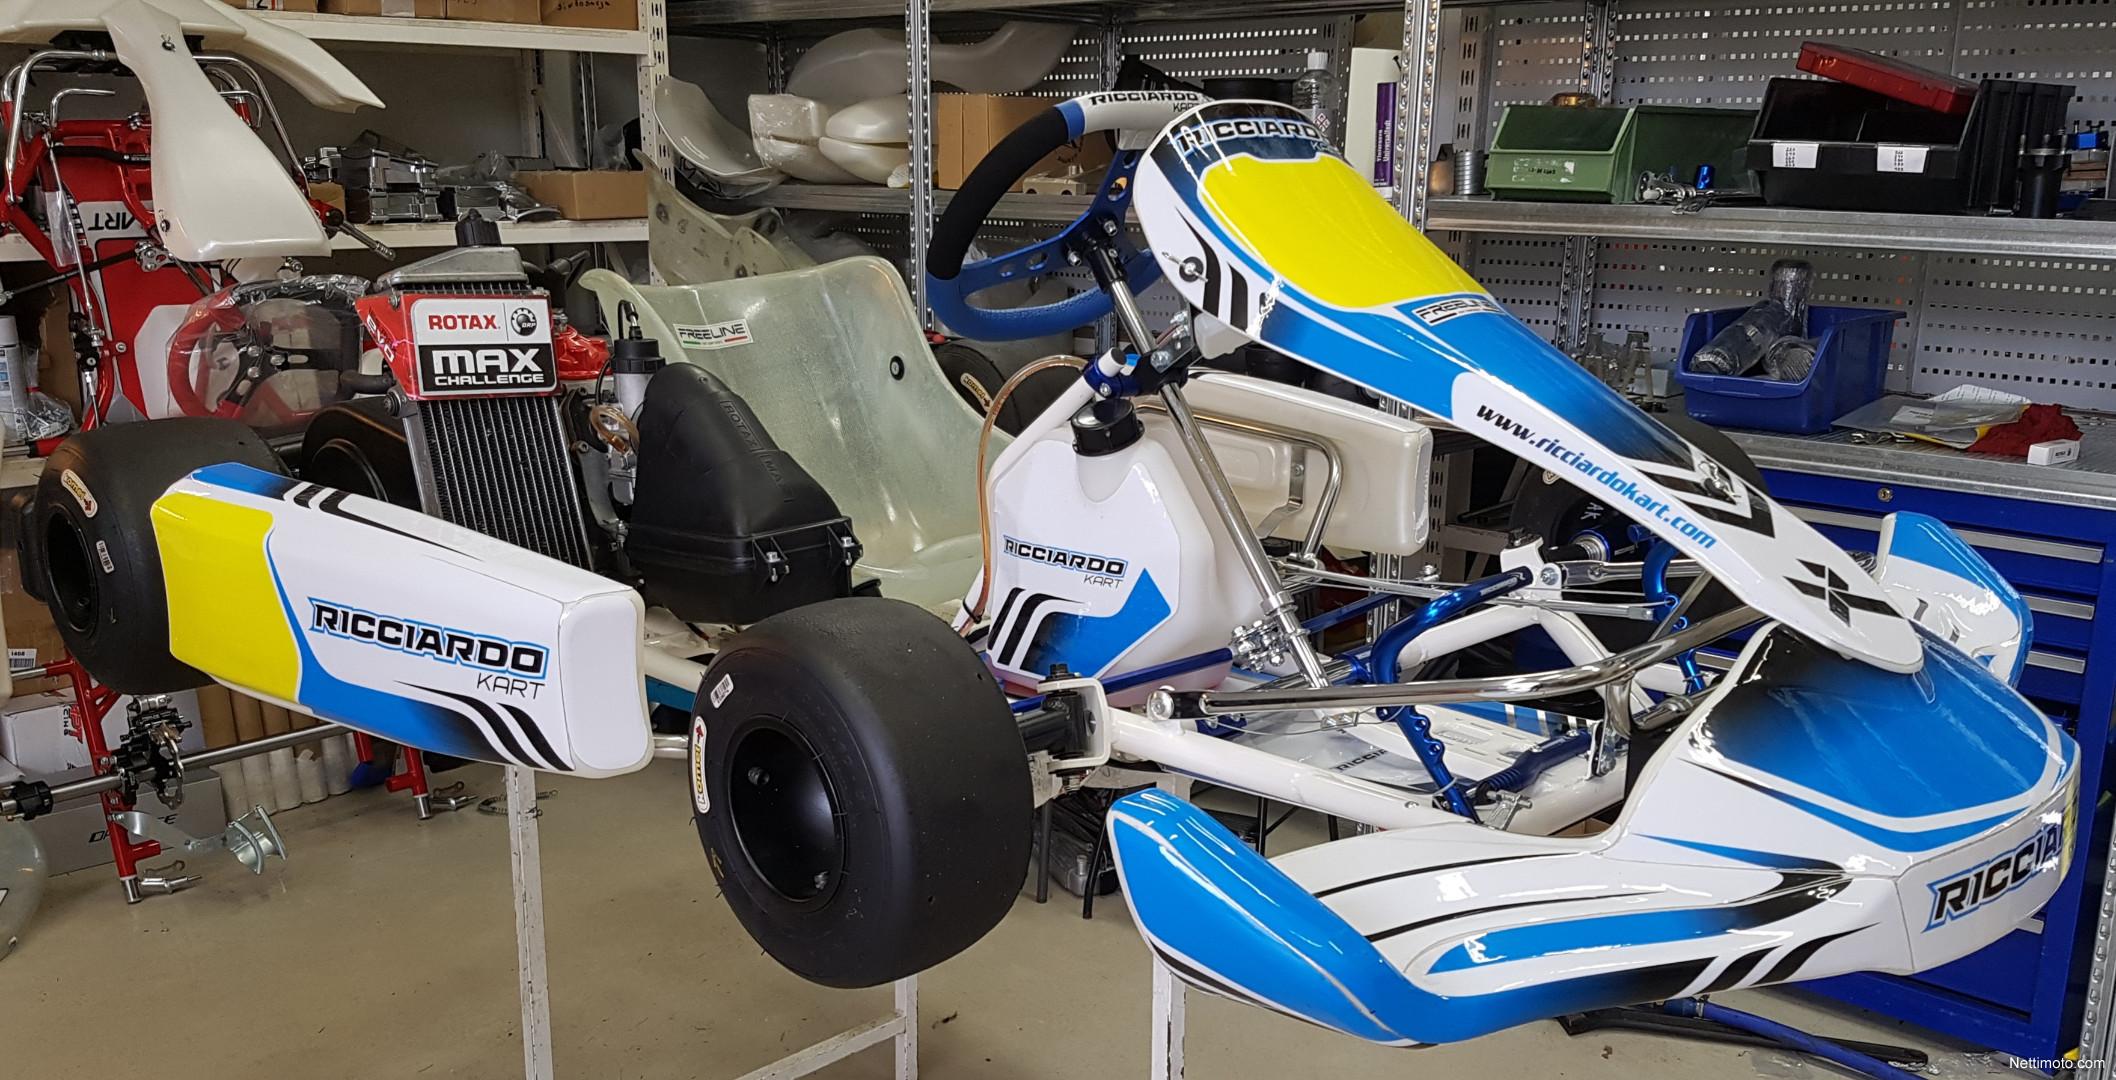 Ricciardo Kart Rotax 125 cm³ 2017 - Kuopio - Go-kart - Nettimoto